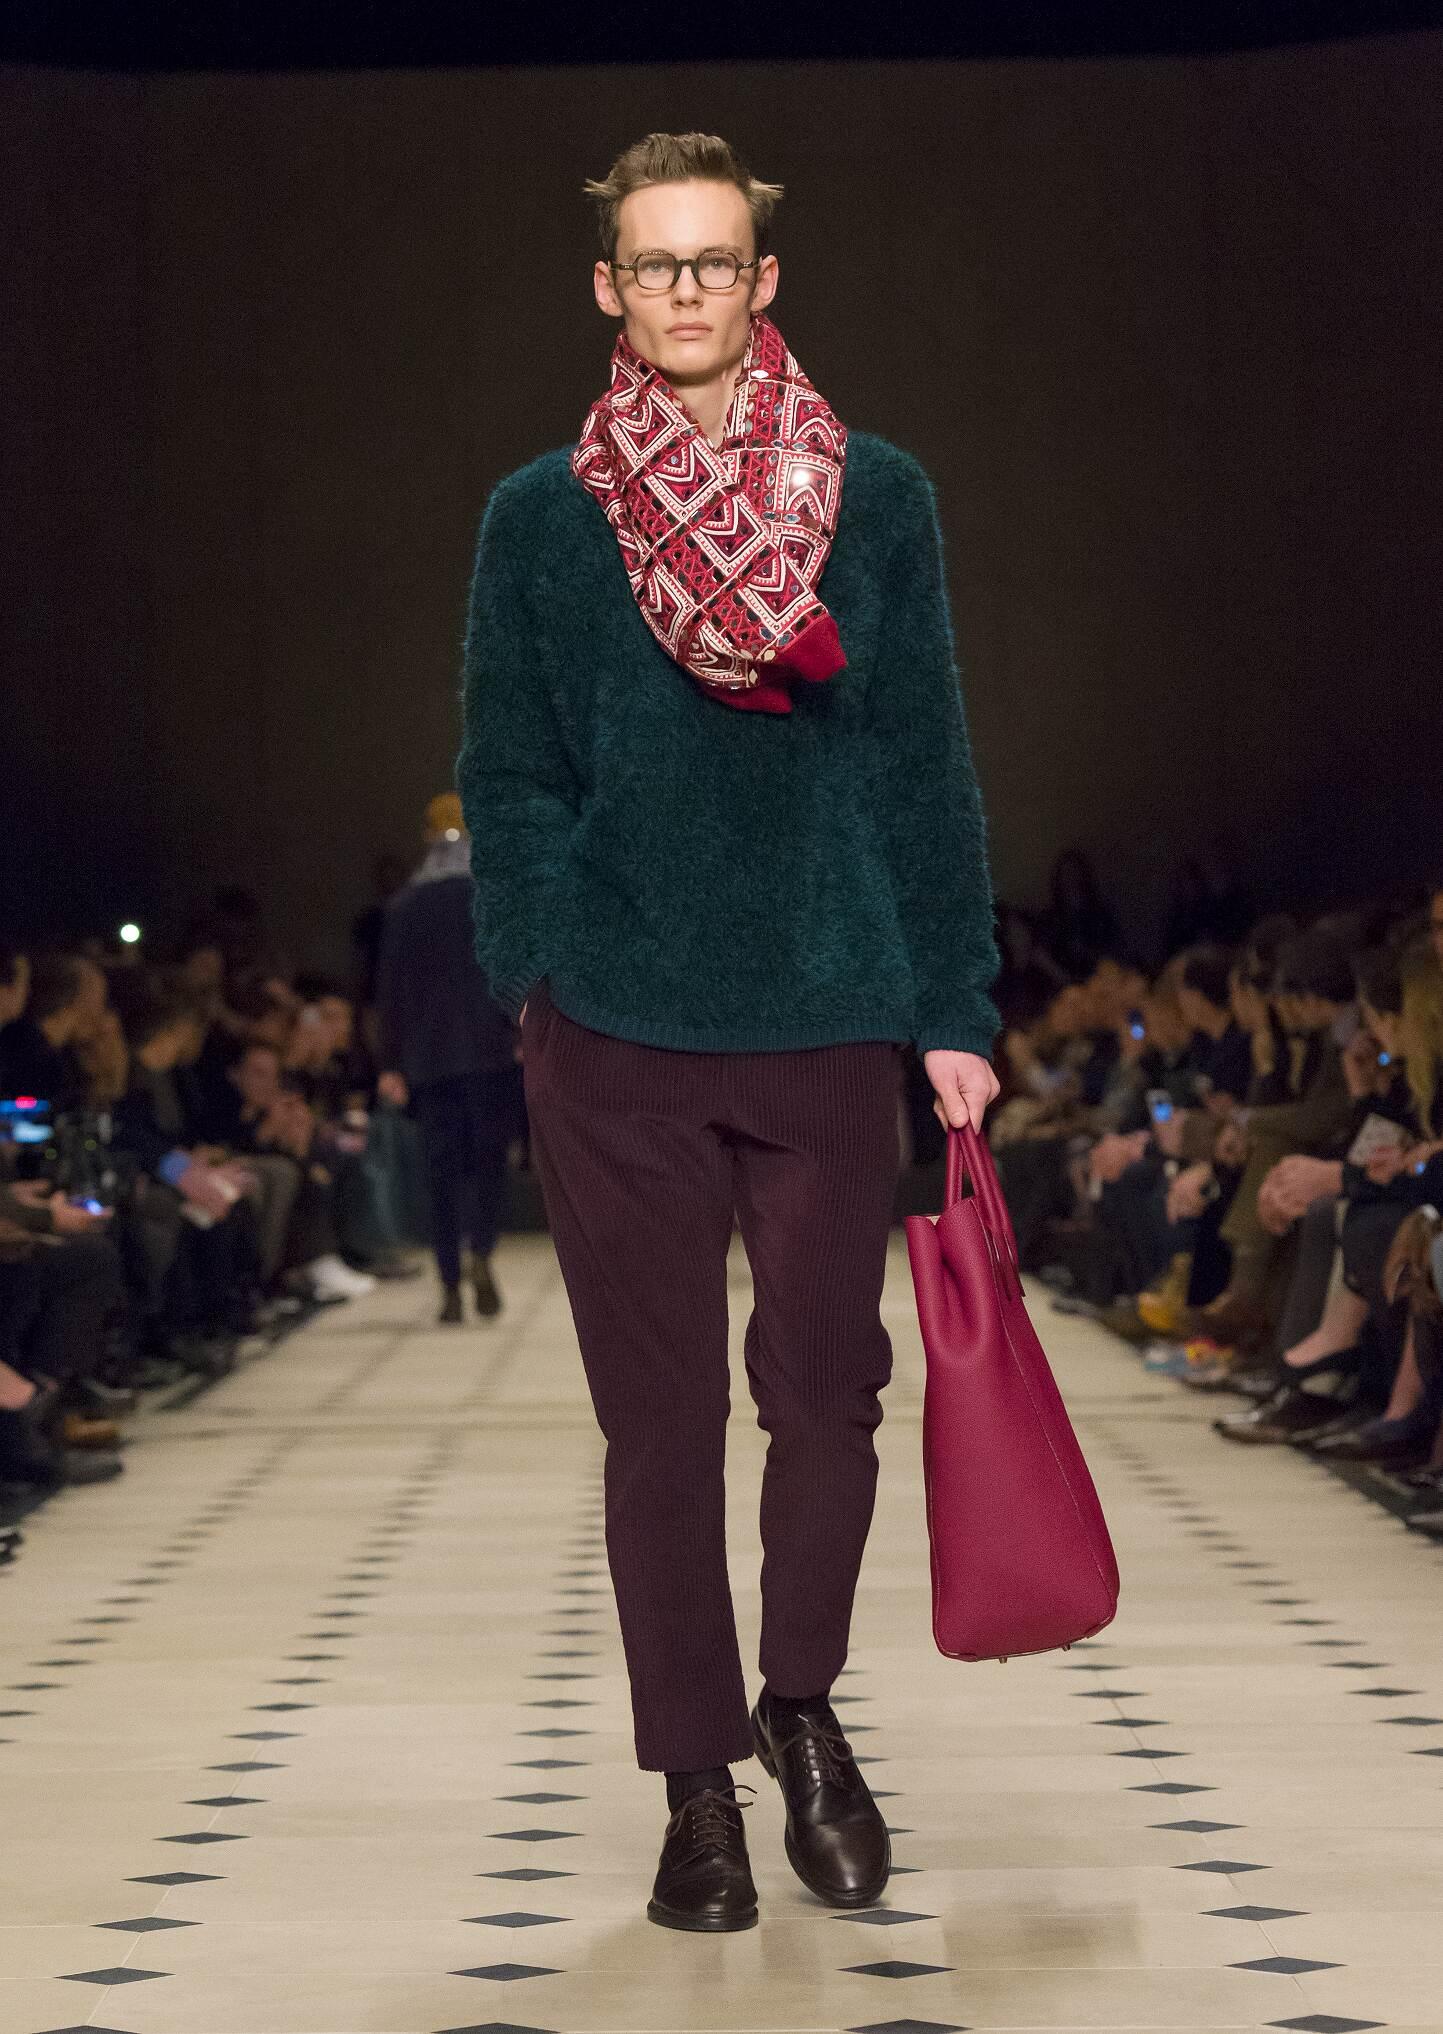 2015 Catwalk Burberry Prorsum Man Fashion Show Winter